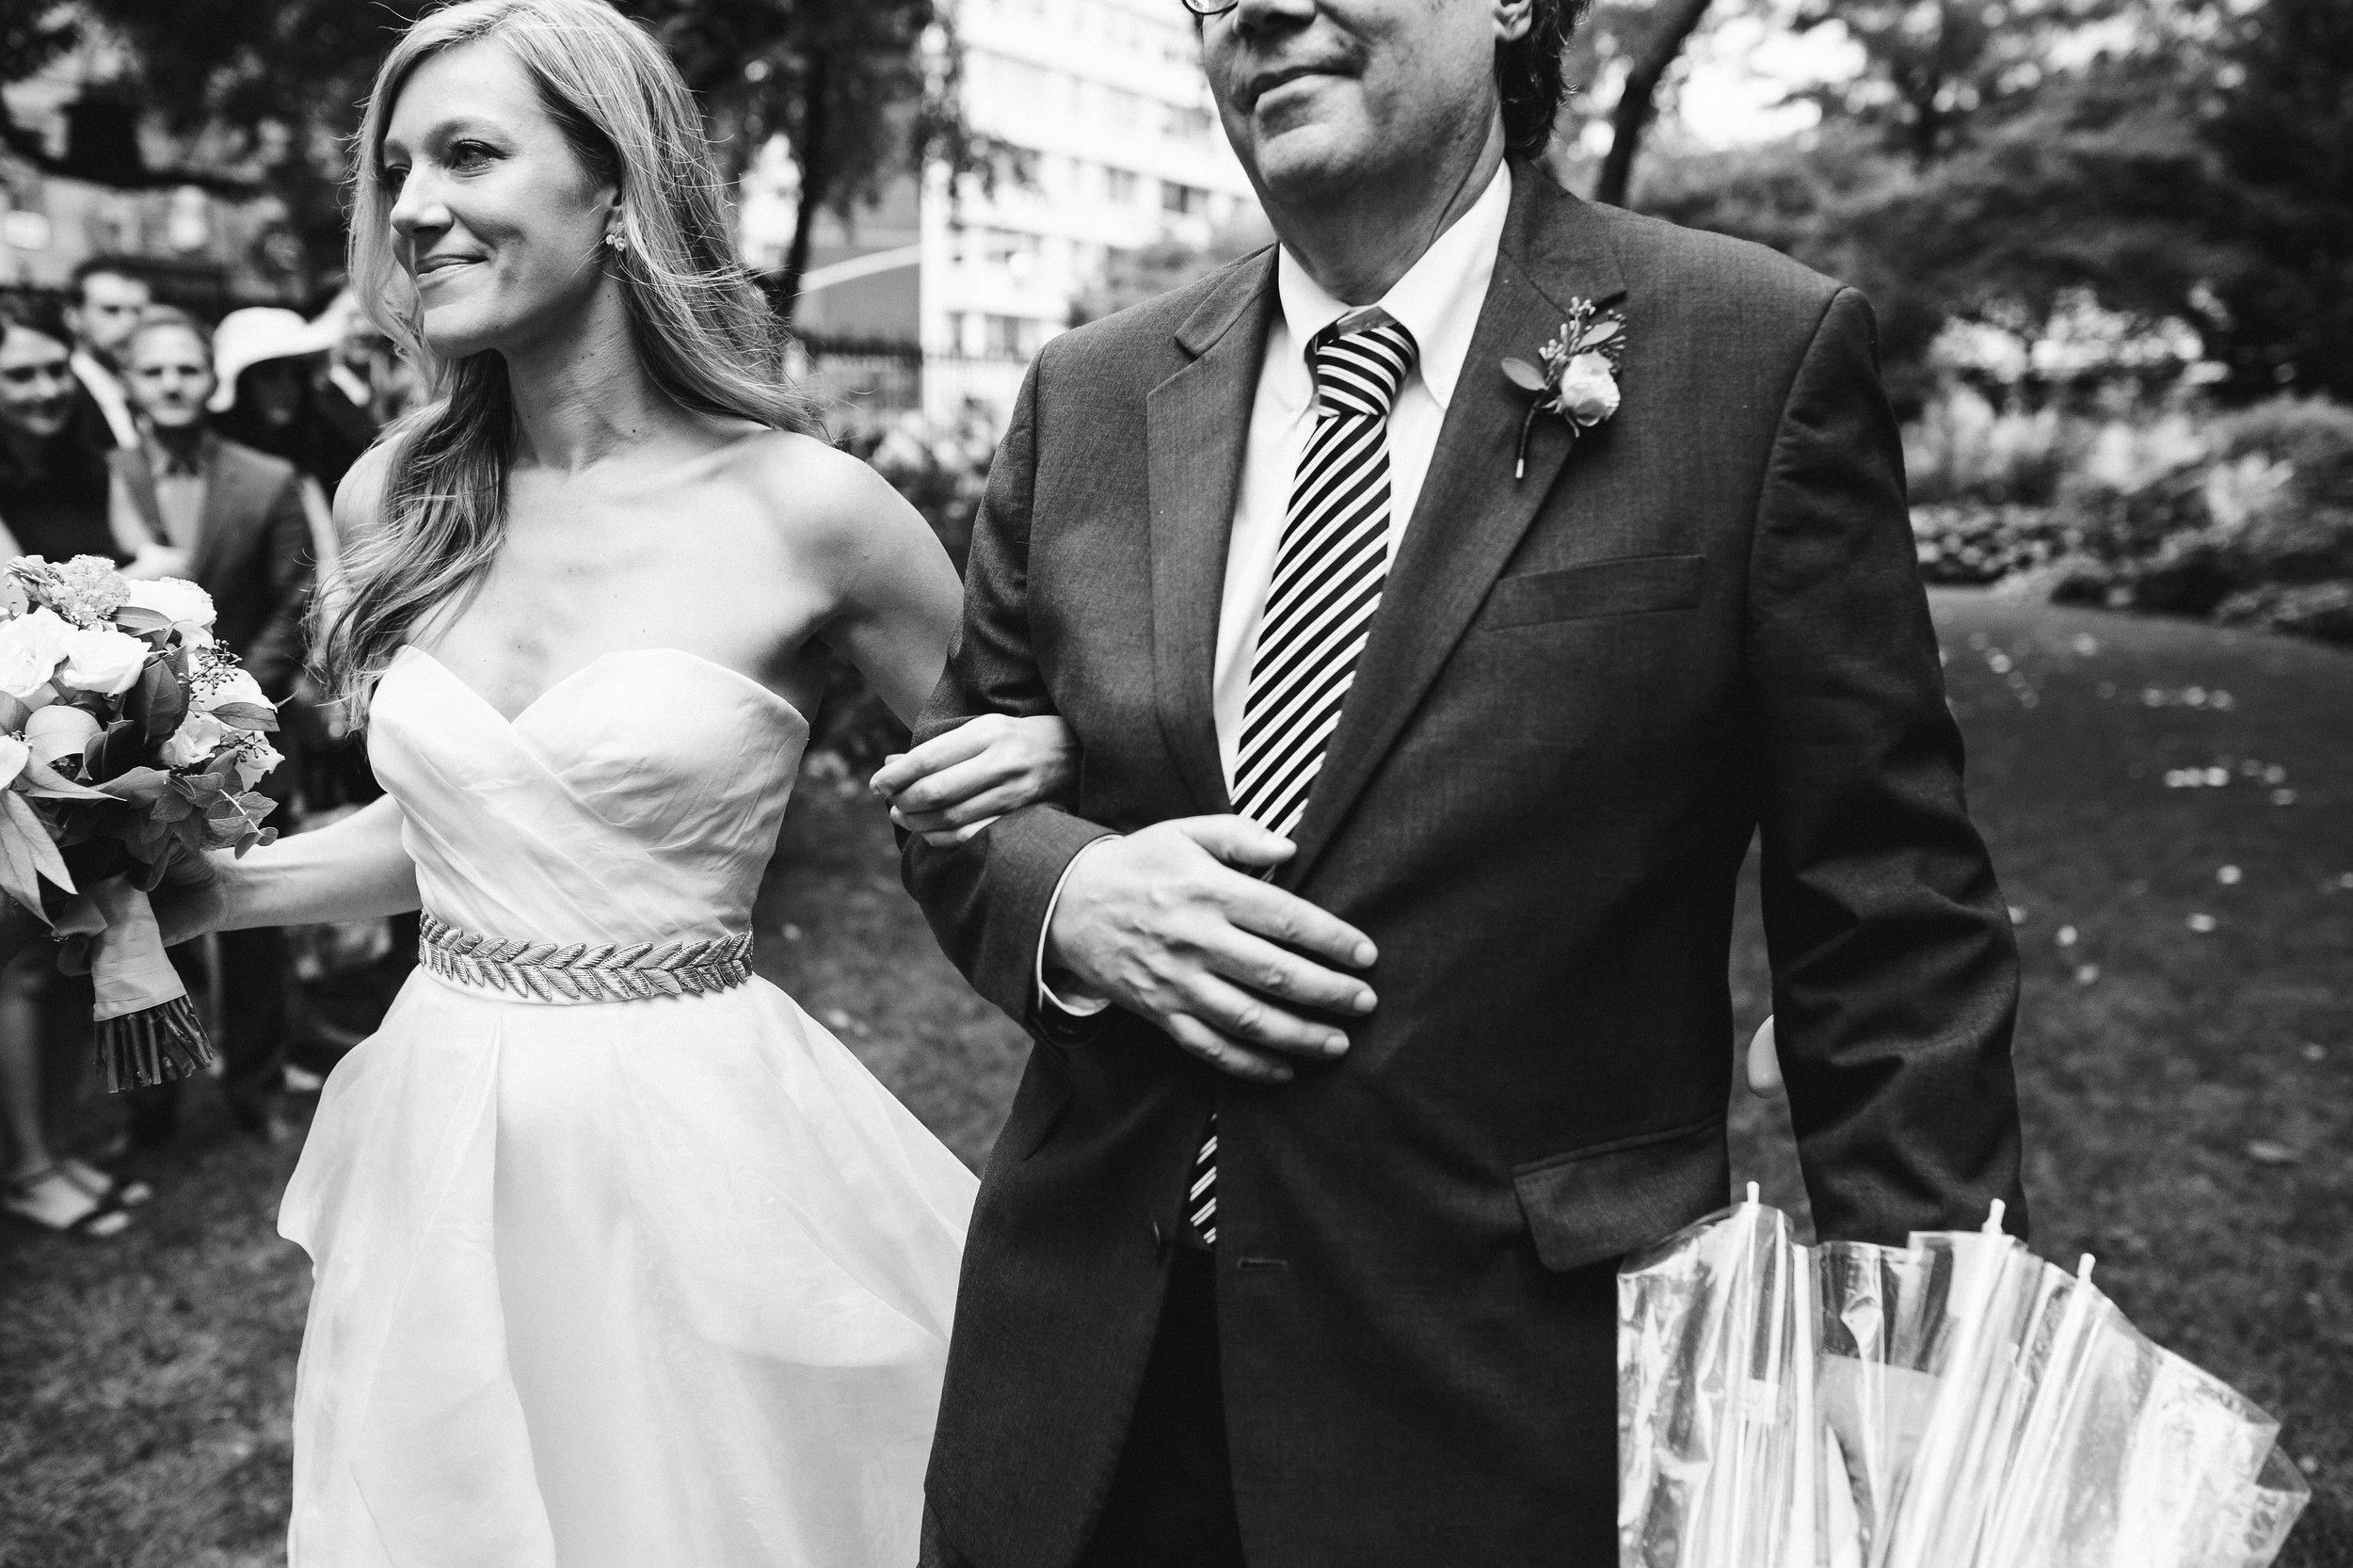 soho-nyc-new-york-wedding-photography-56.jpg